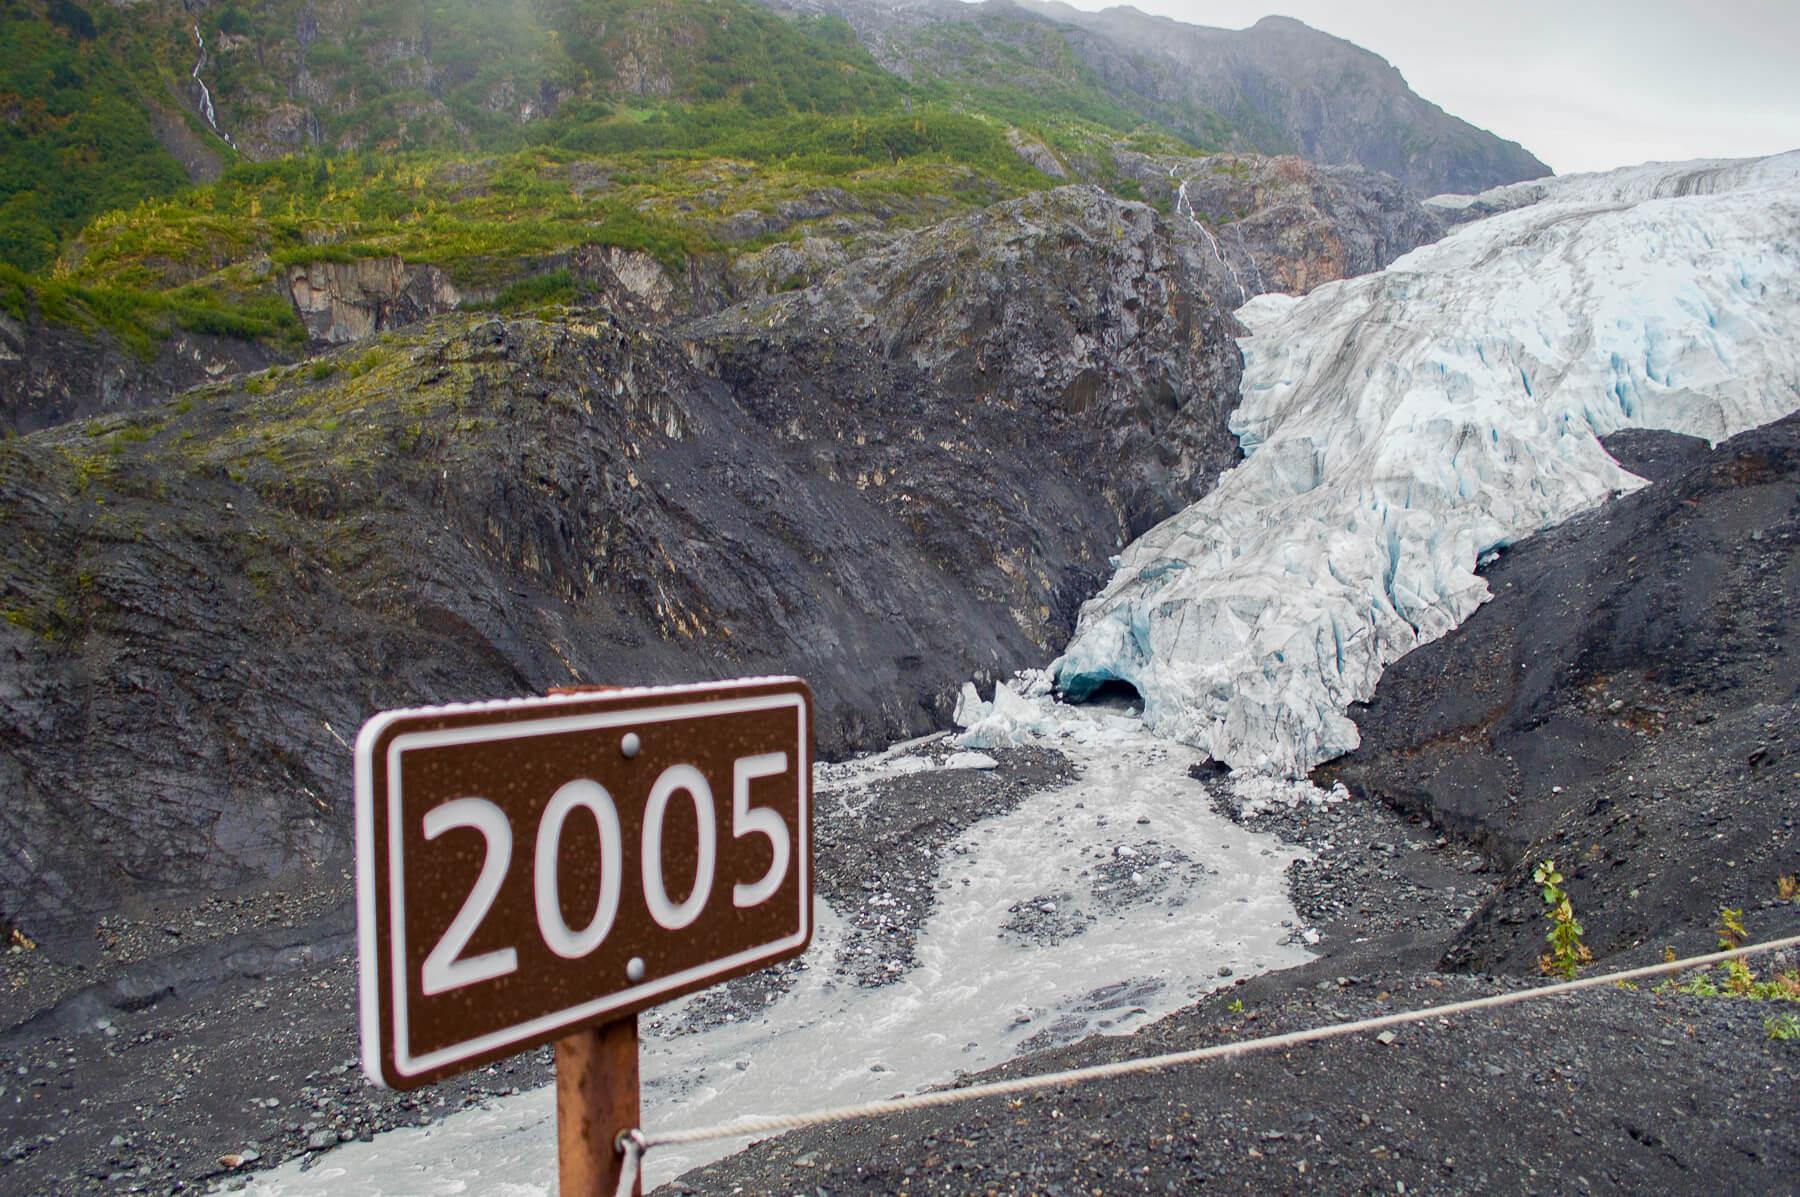 exit glacier comparison from 2005